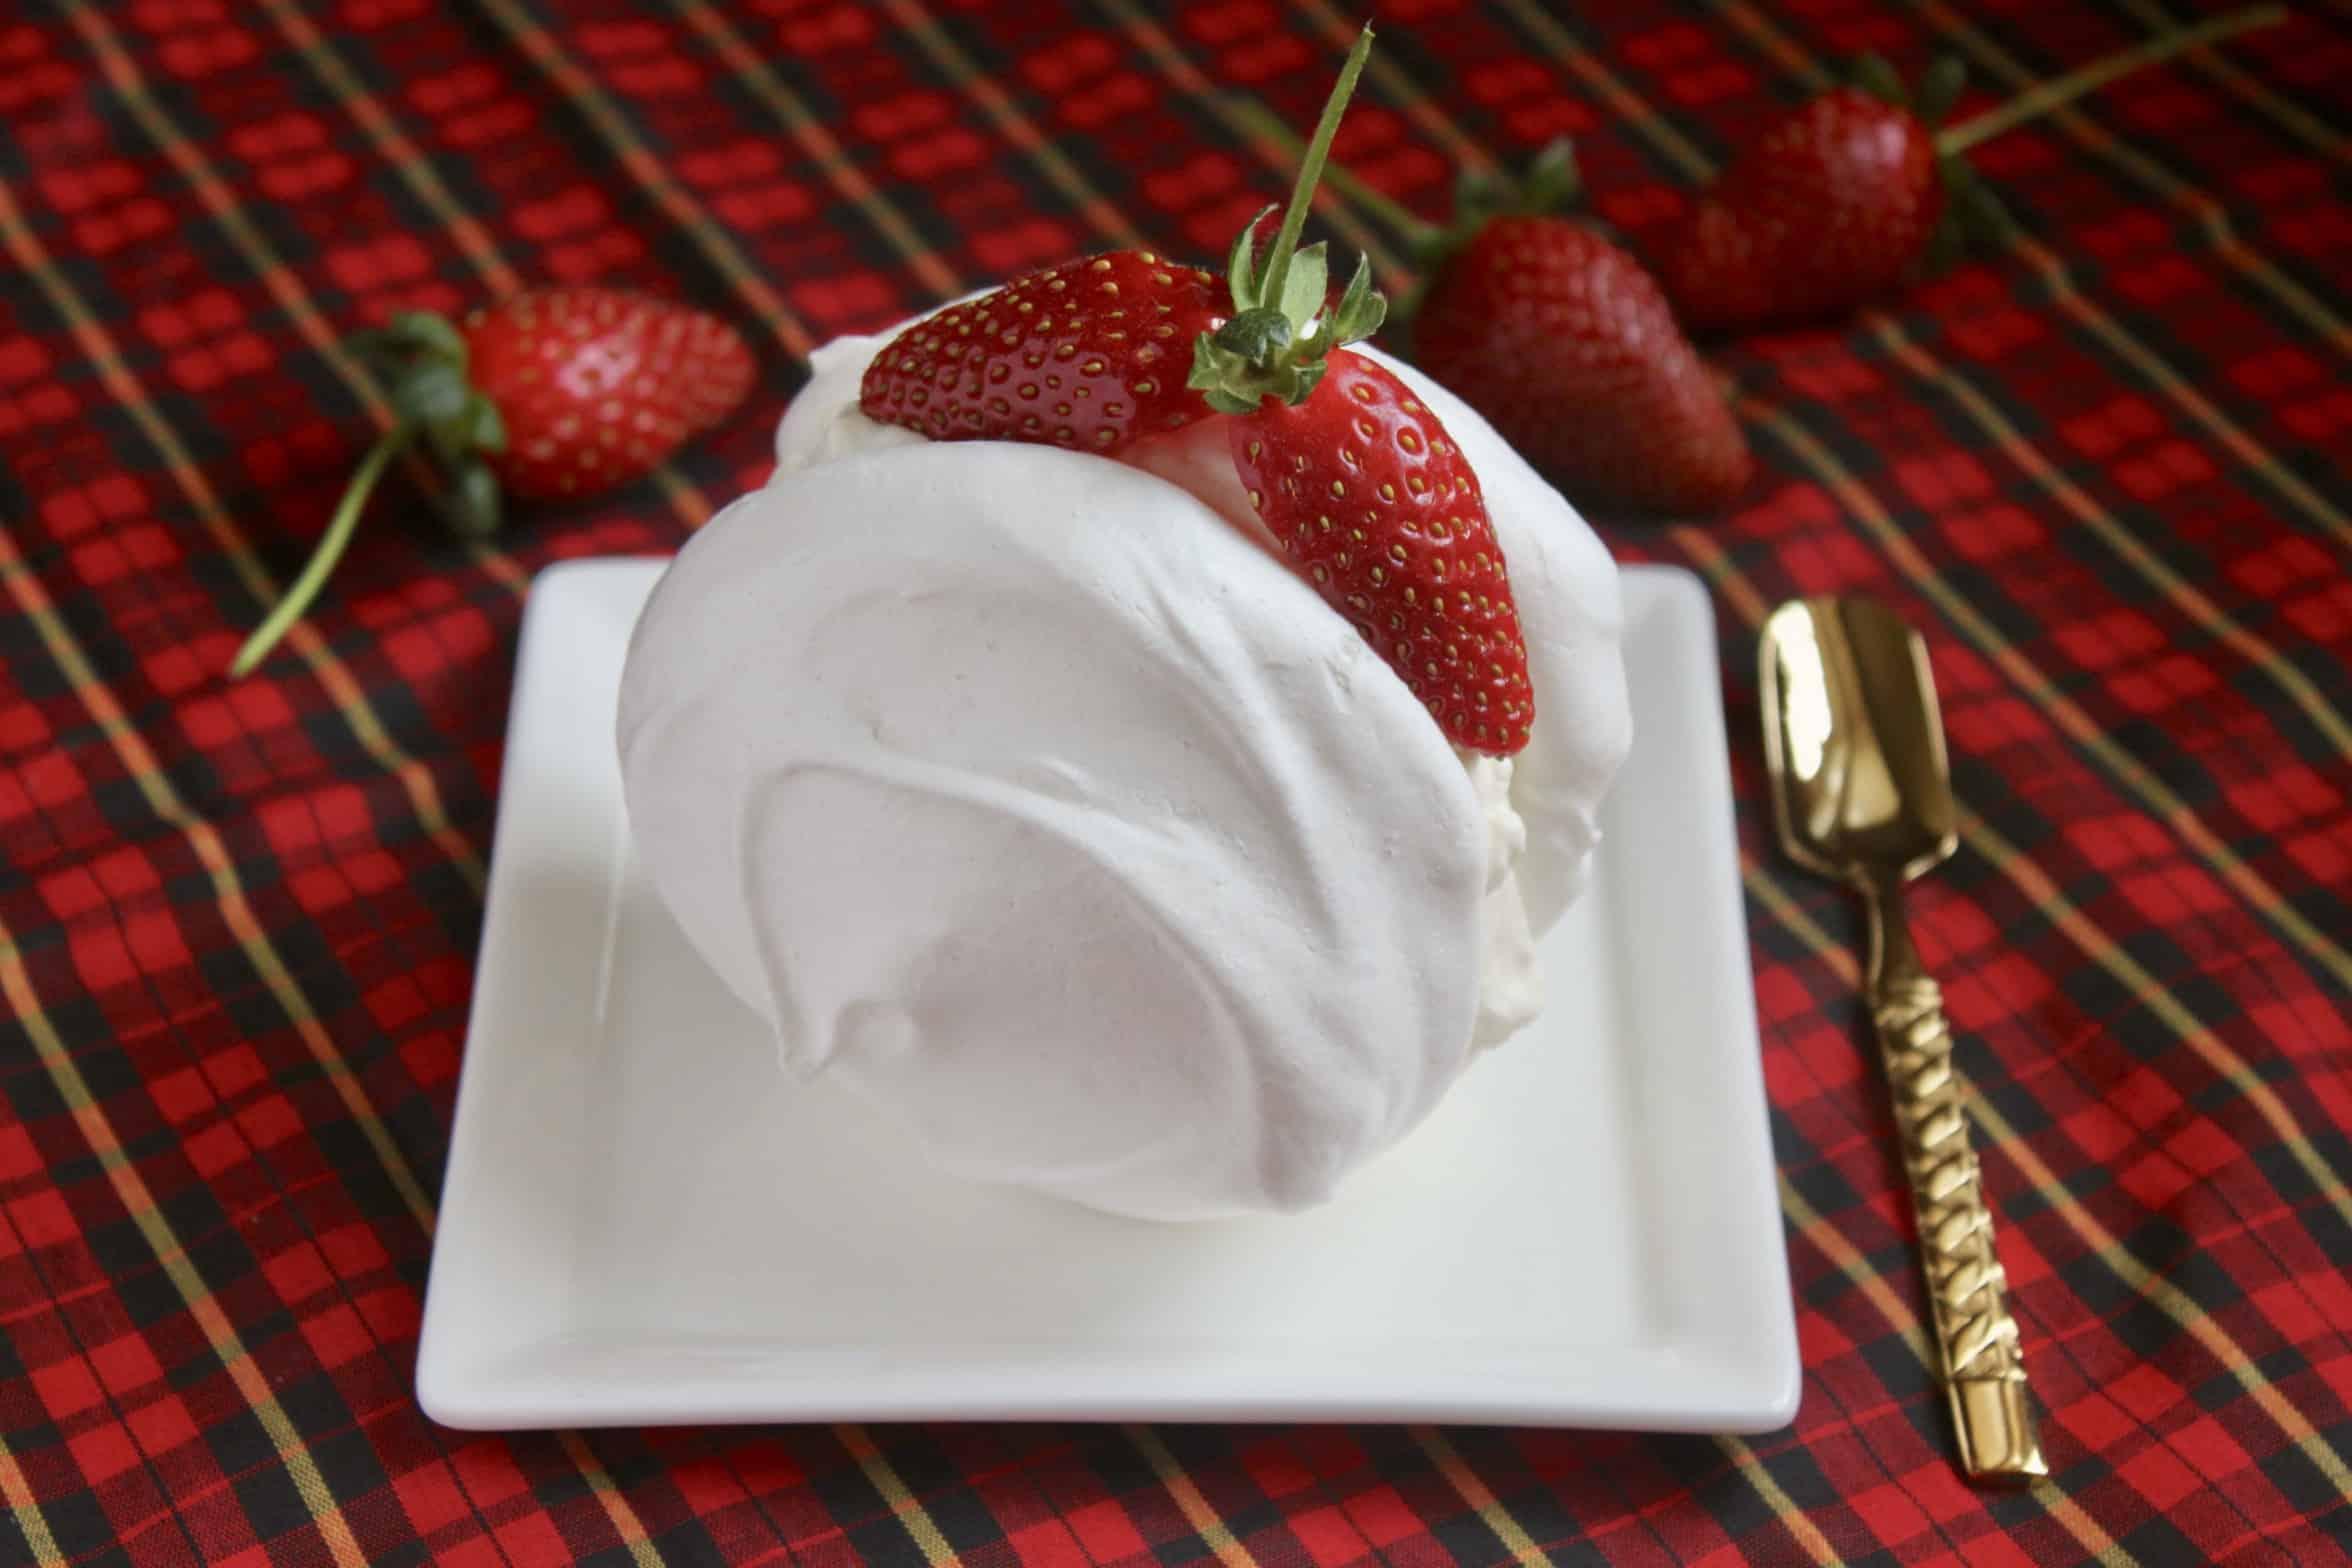 Meringue and fresh cream with strawberries